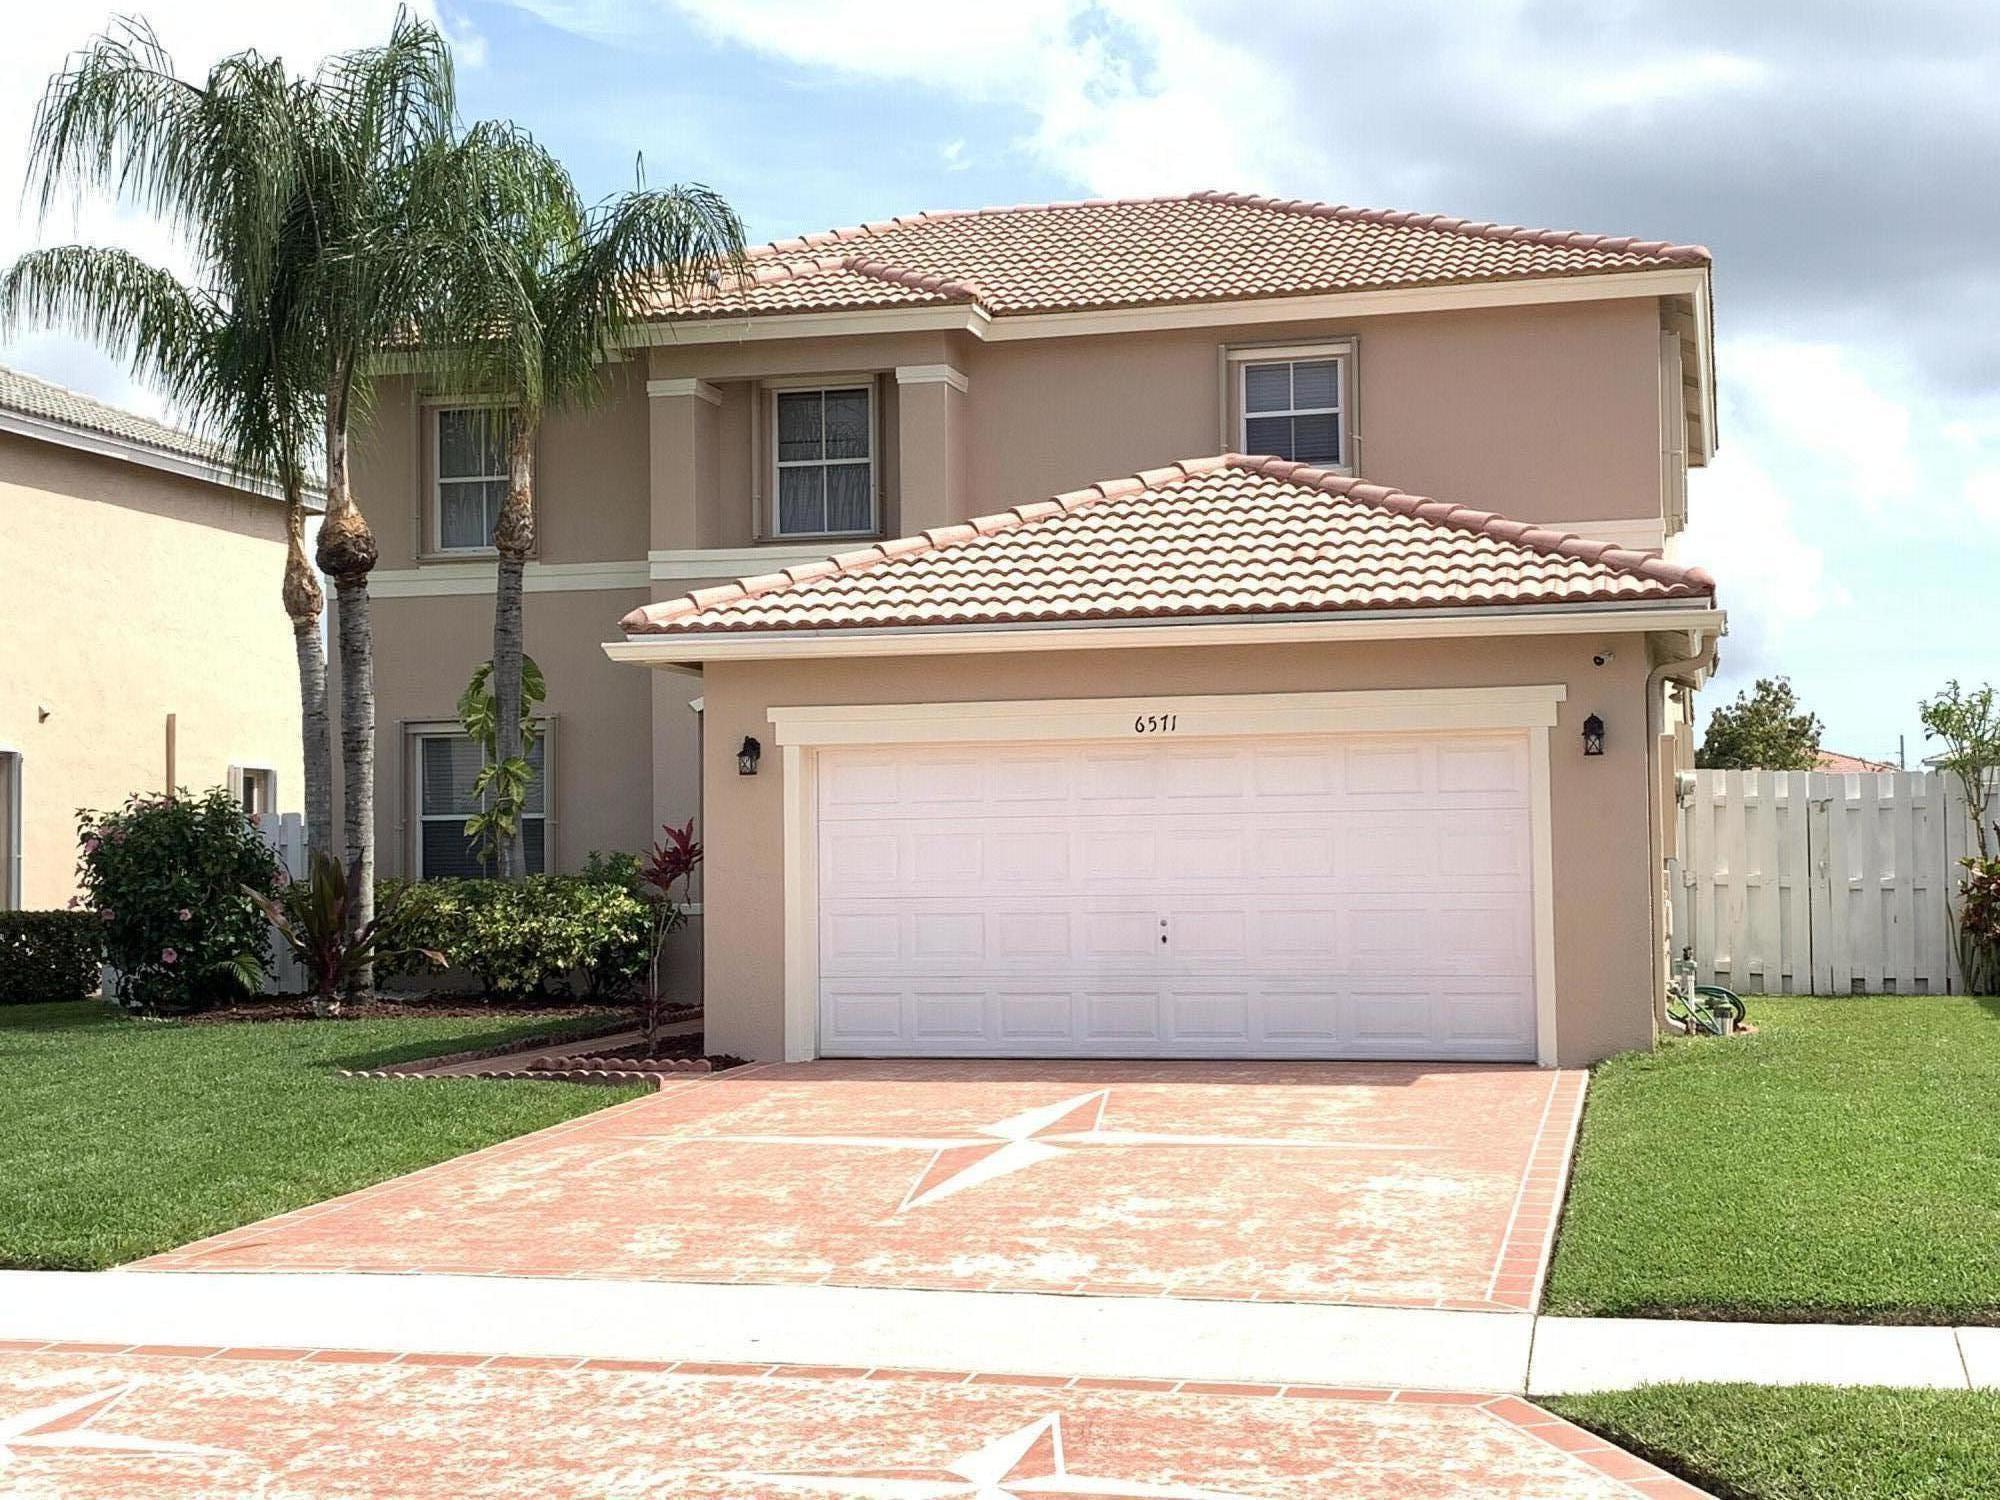 6571 Spring Meadow, Greenacres, Florida 33413